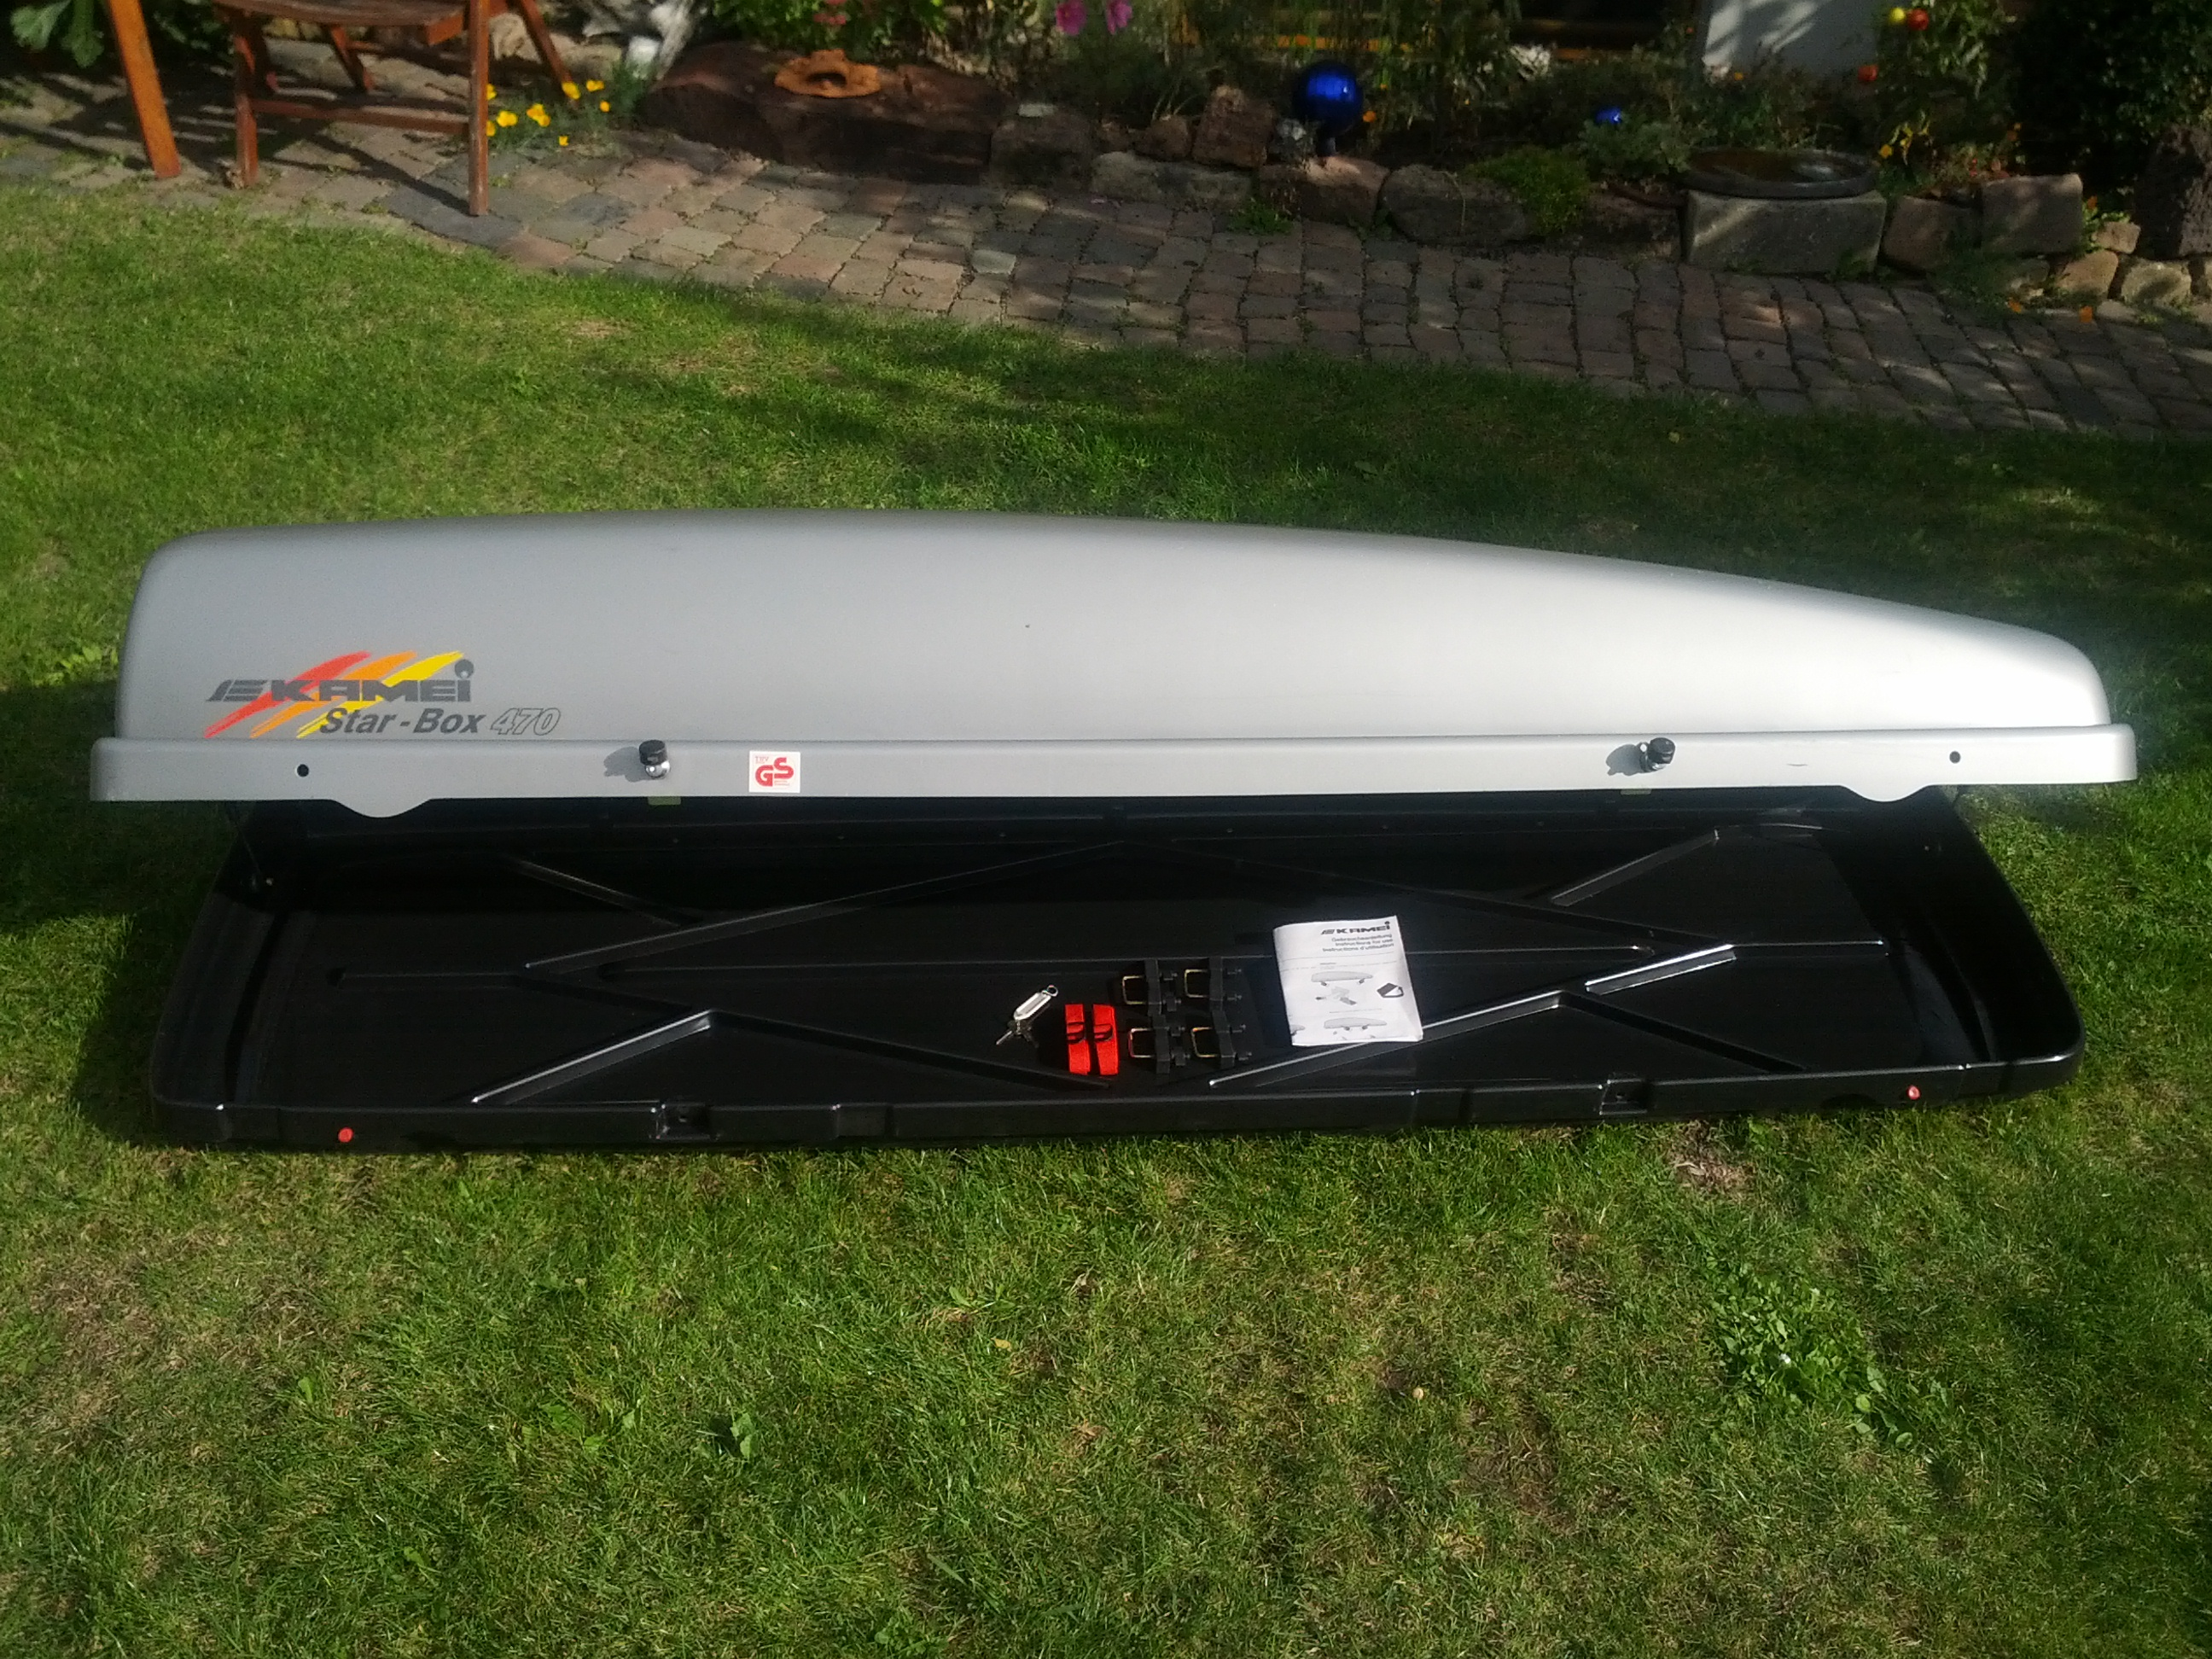 dachbox kamei star box 470 inkl zubeh r jetpack ski box biete. Black Bedroom Furniture Sets. Home Design Ideas